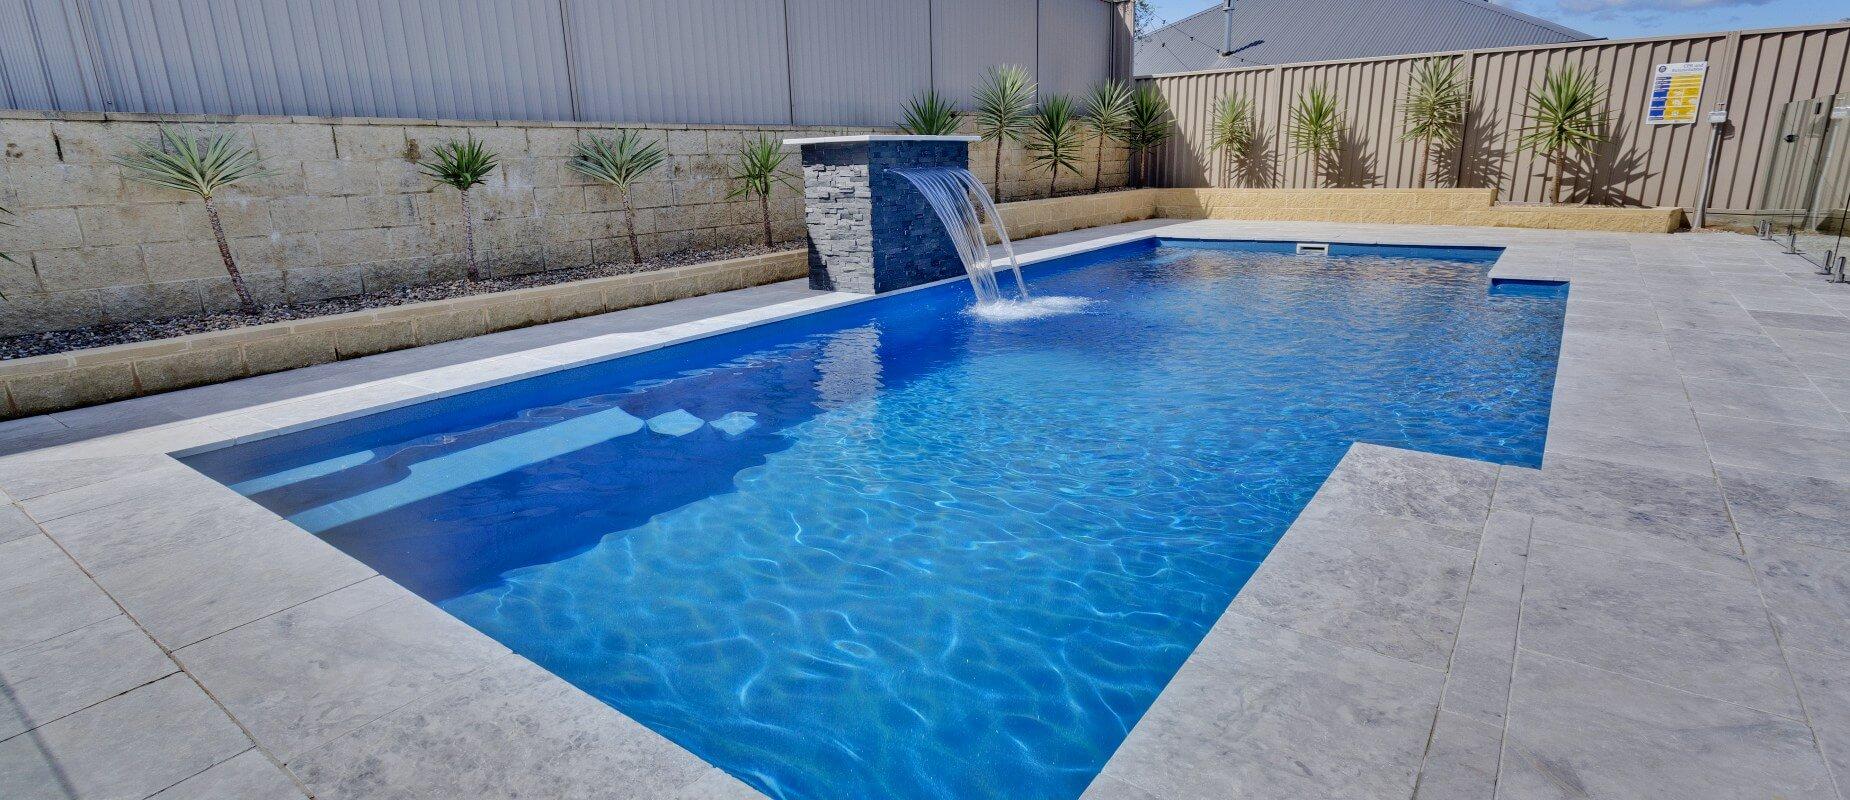 piscina de lux modele frumoase 38